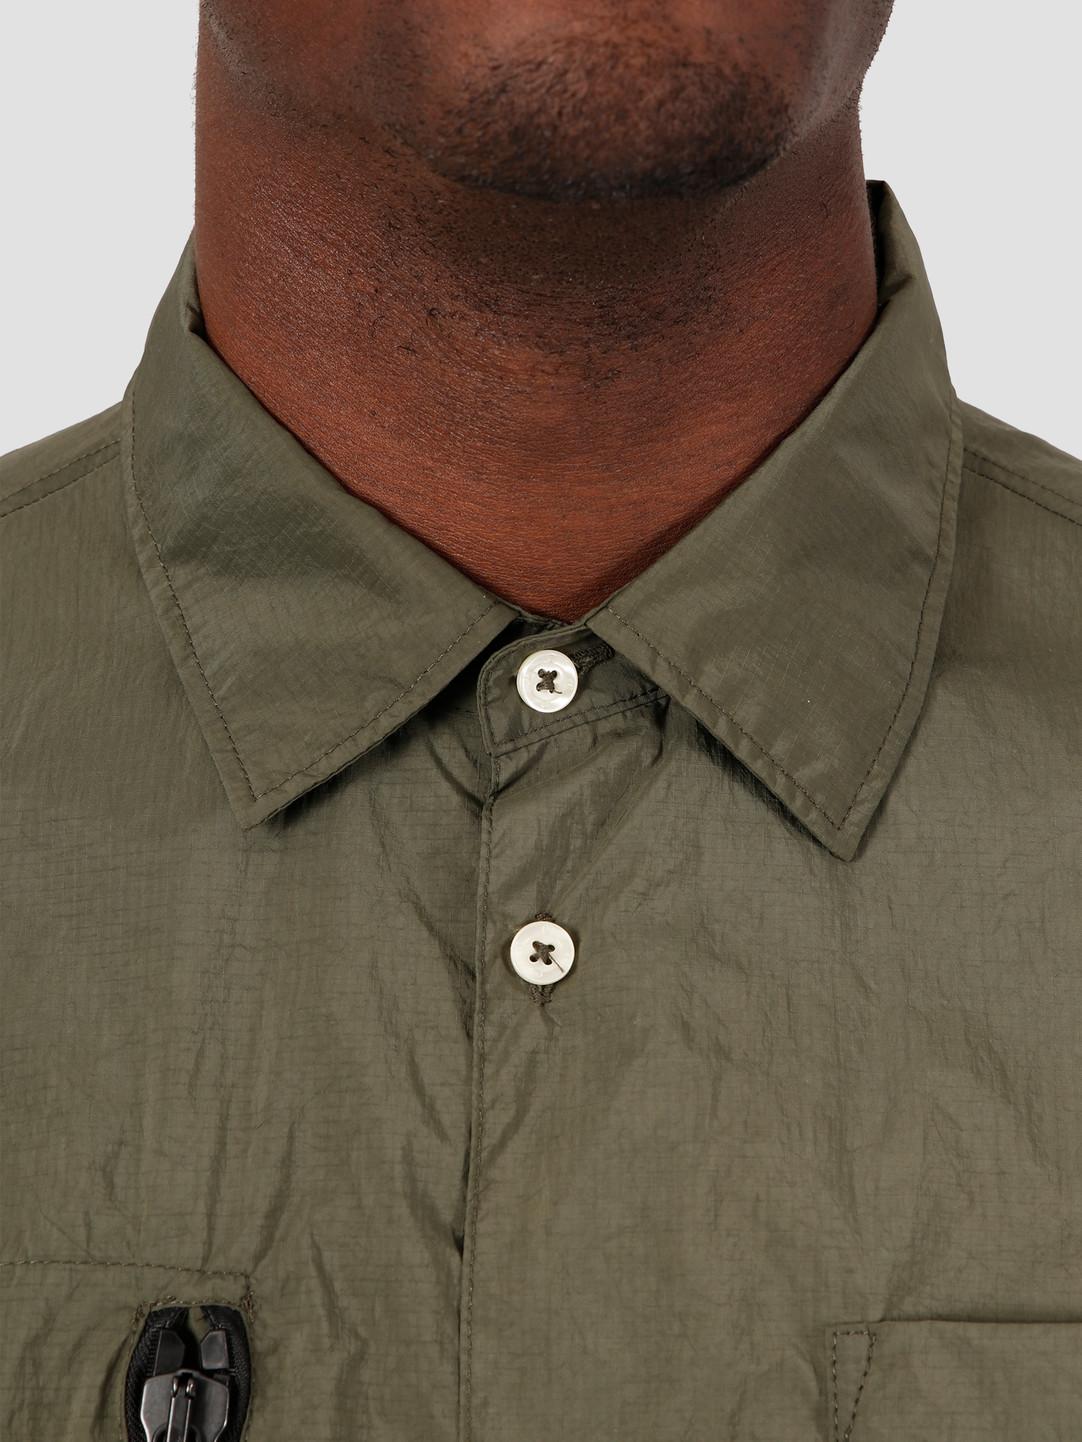 Champion Champion Shirt Green IRL 214507-GS519